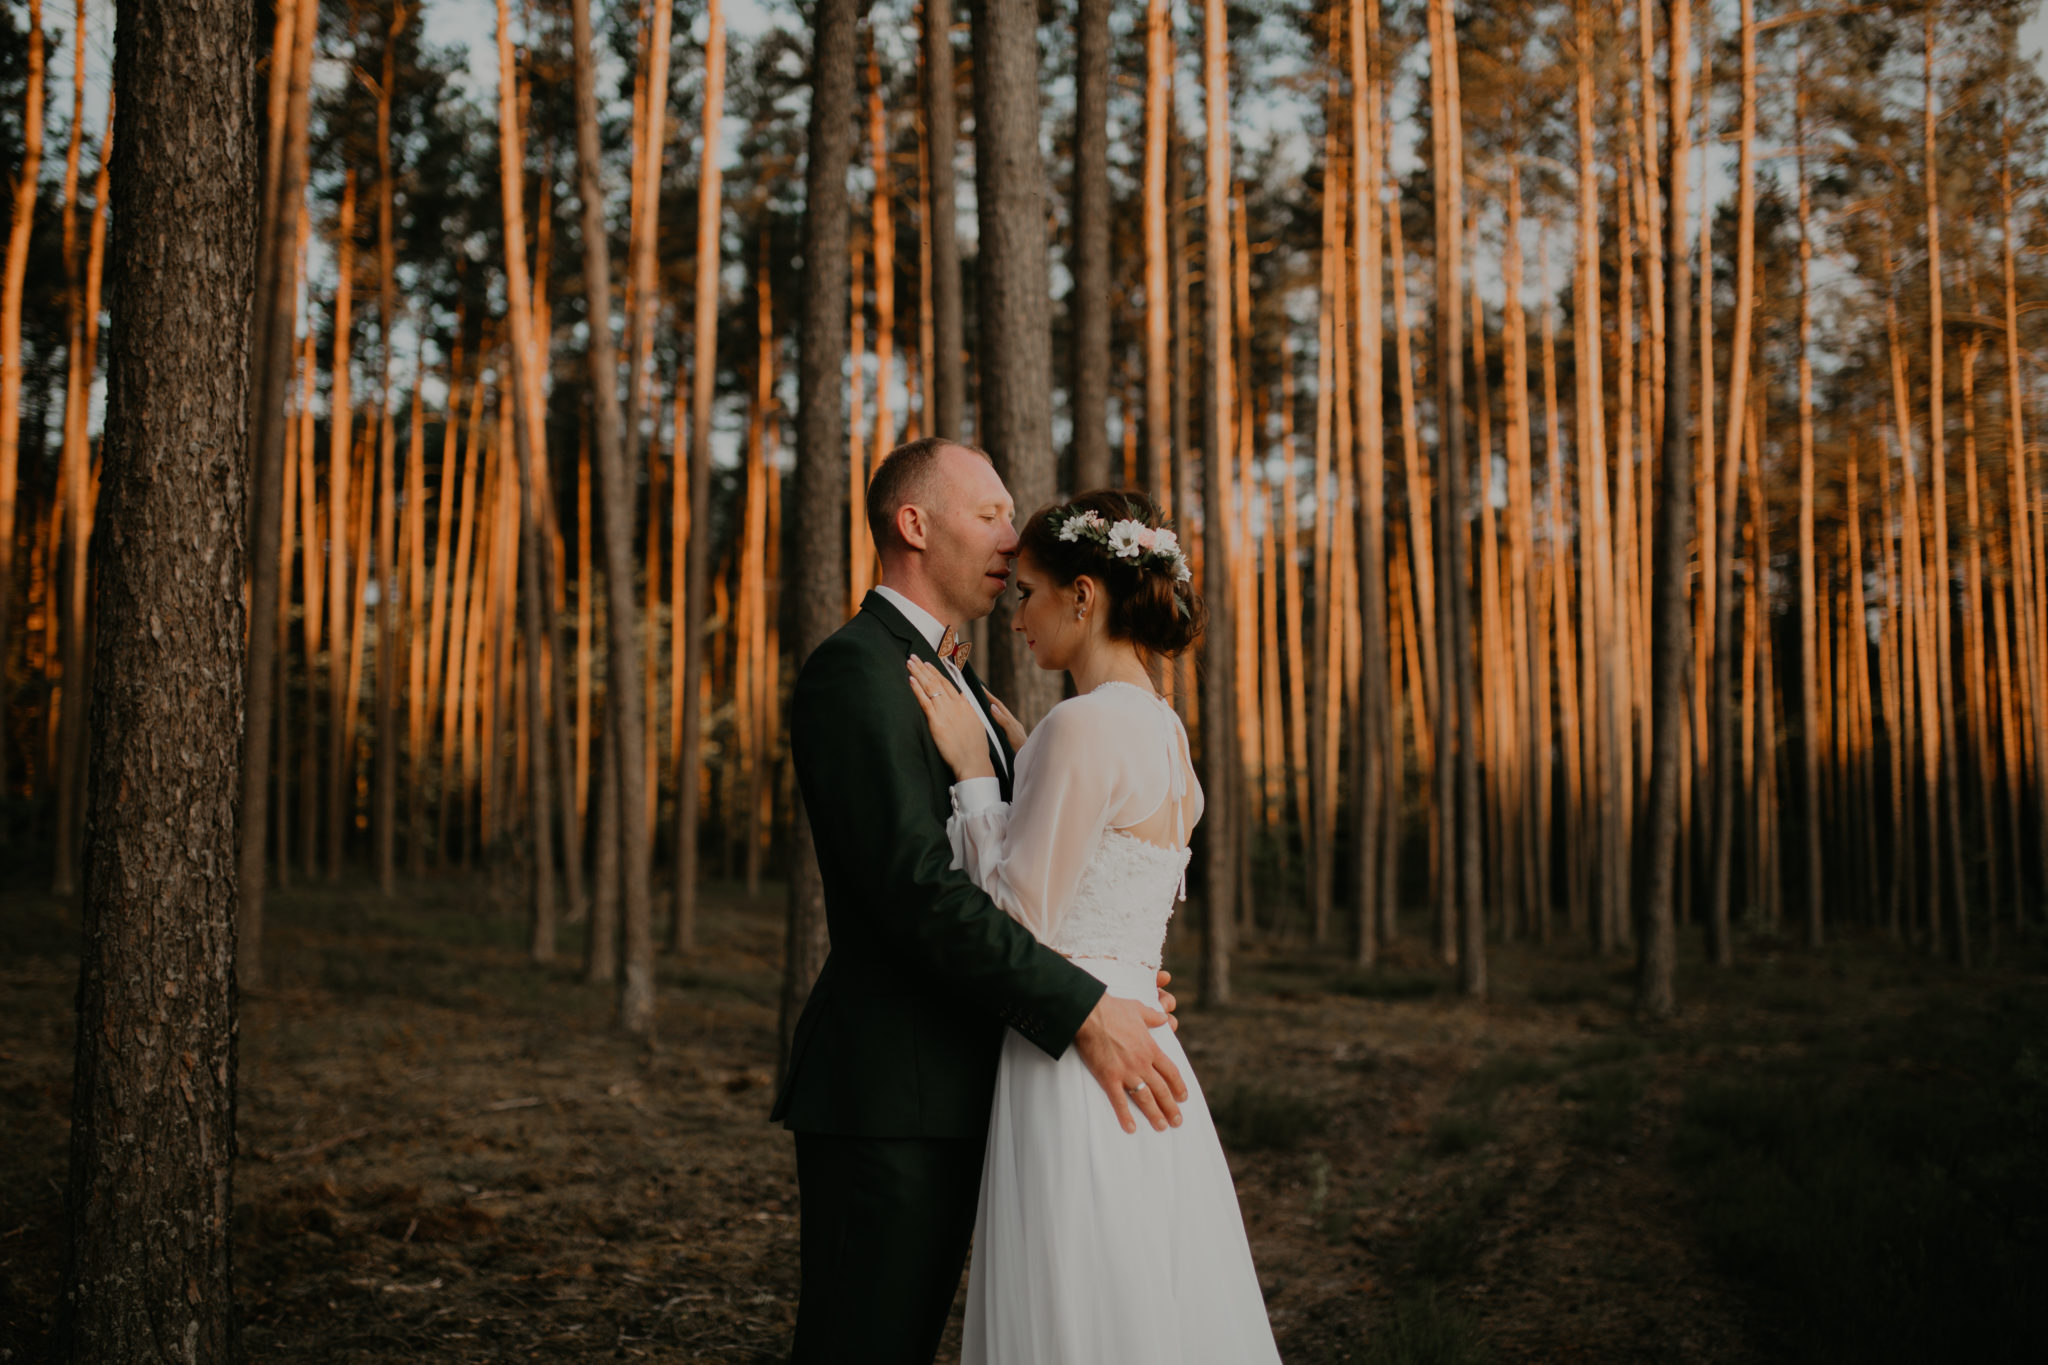 gosia i kubaplener 17 1 - fotografiagk Fotografia ślubna RK wedding